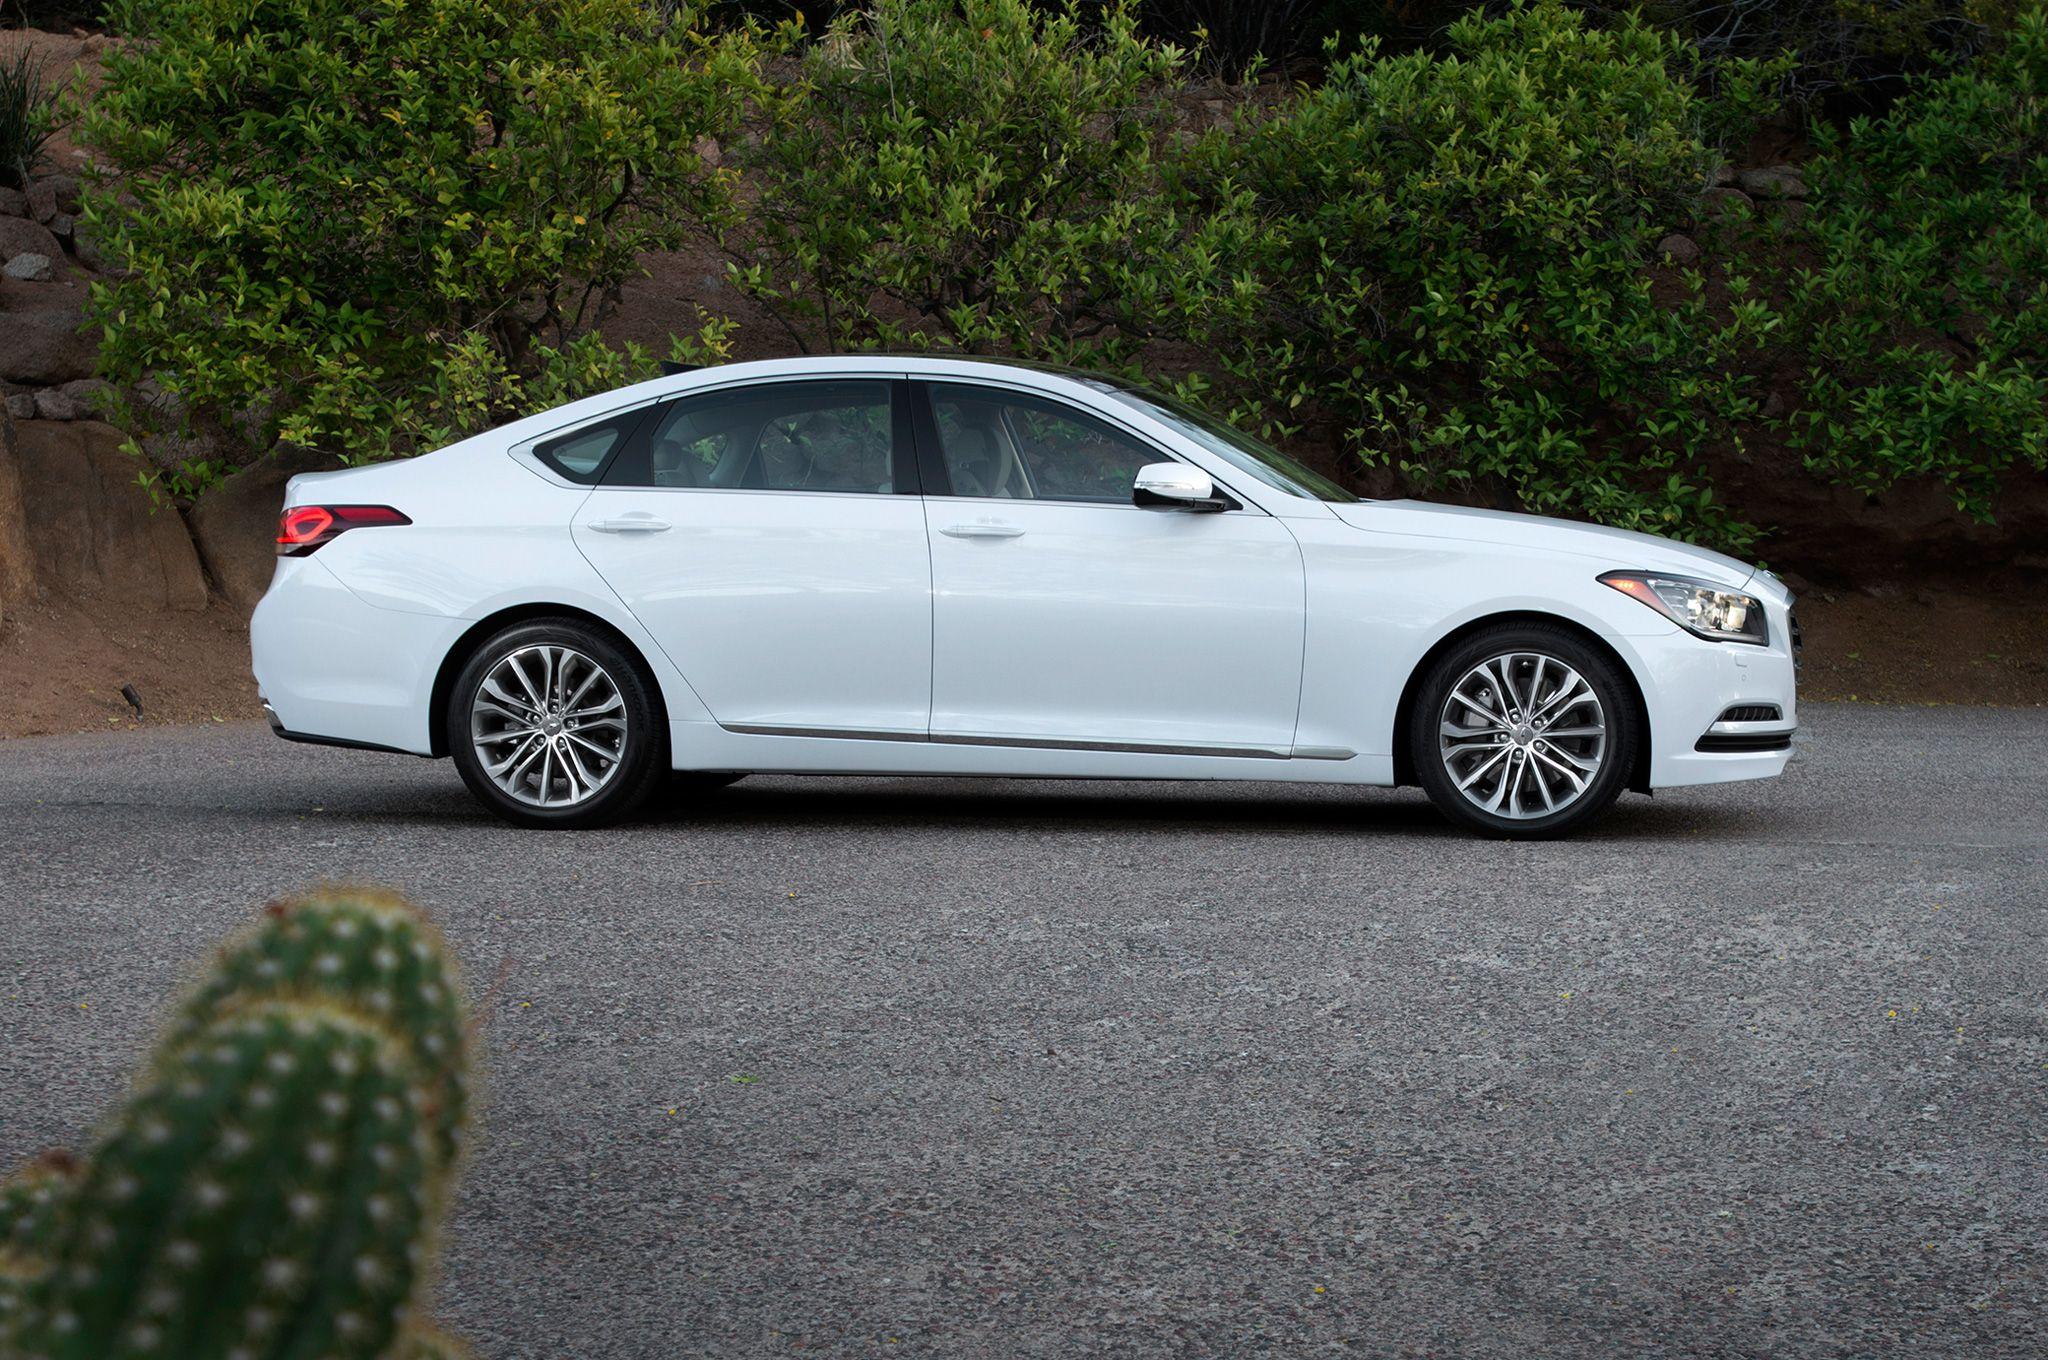 2015 Hyundai Genesis Sedan Side View Lights On